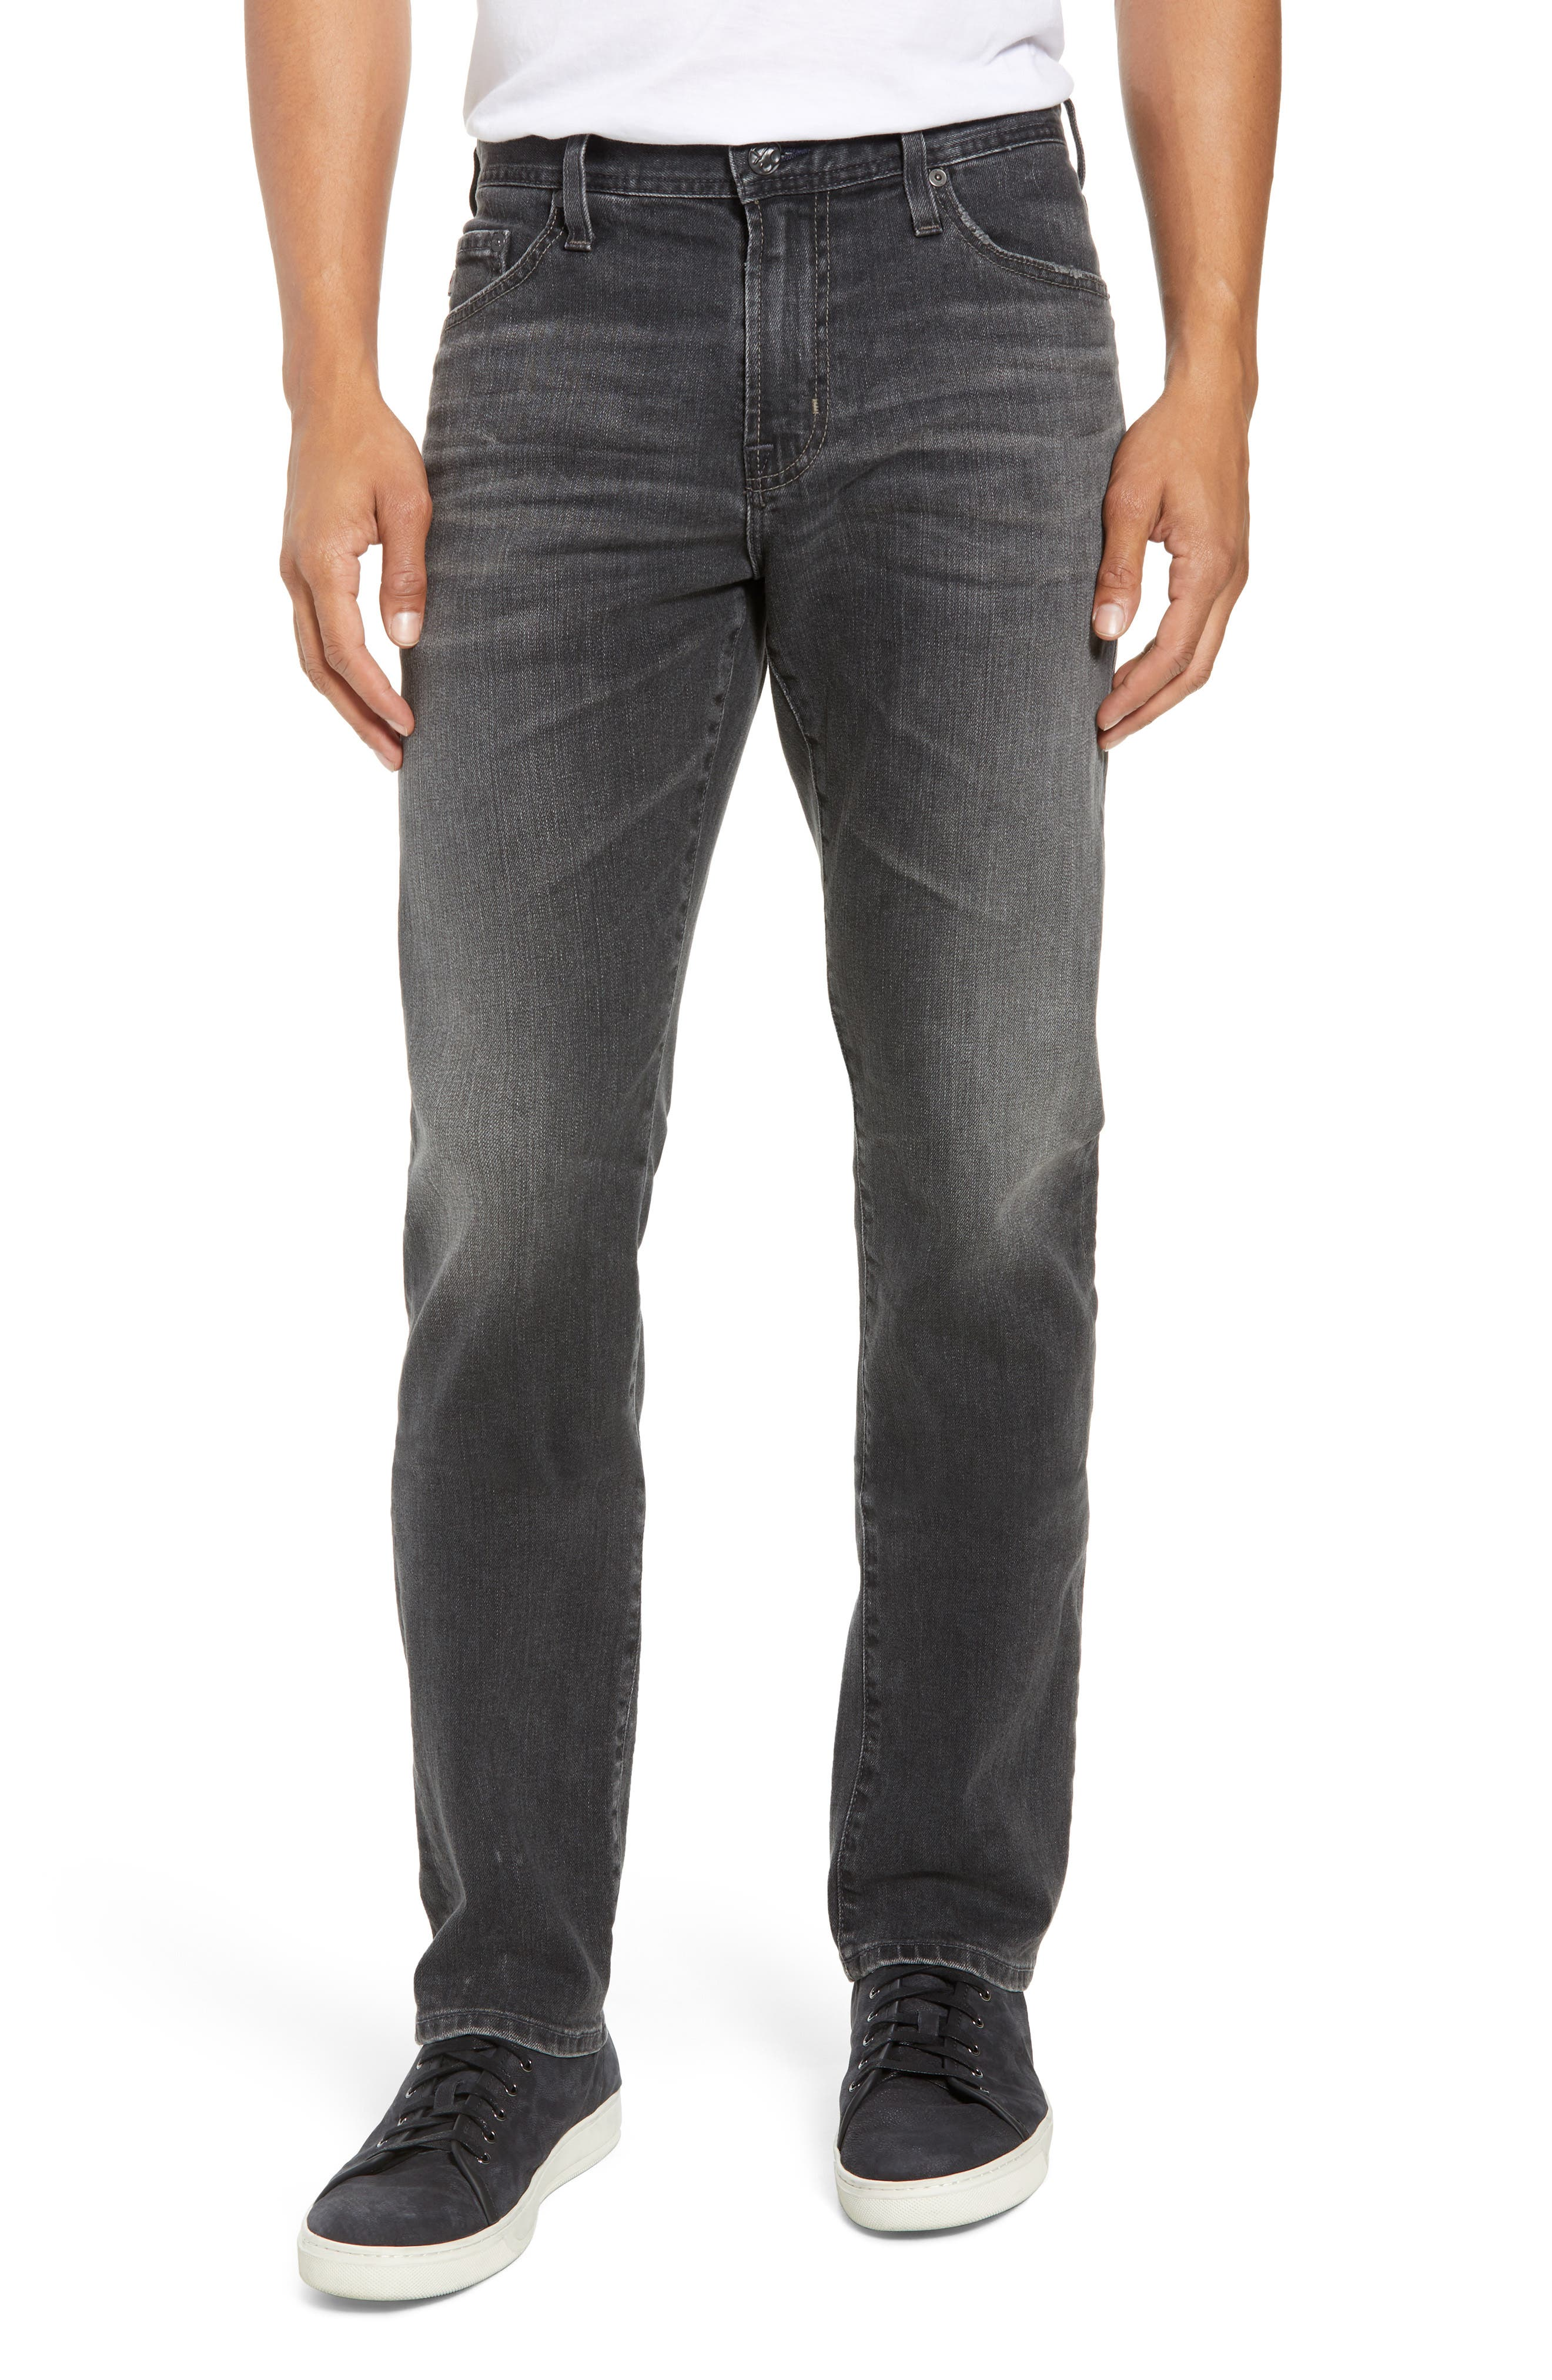 AG, Everett Slim Straight Leg Jeans, Main thumbnail 1, color, 6 YEARS ARCADE